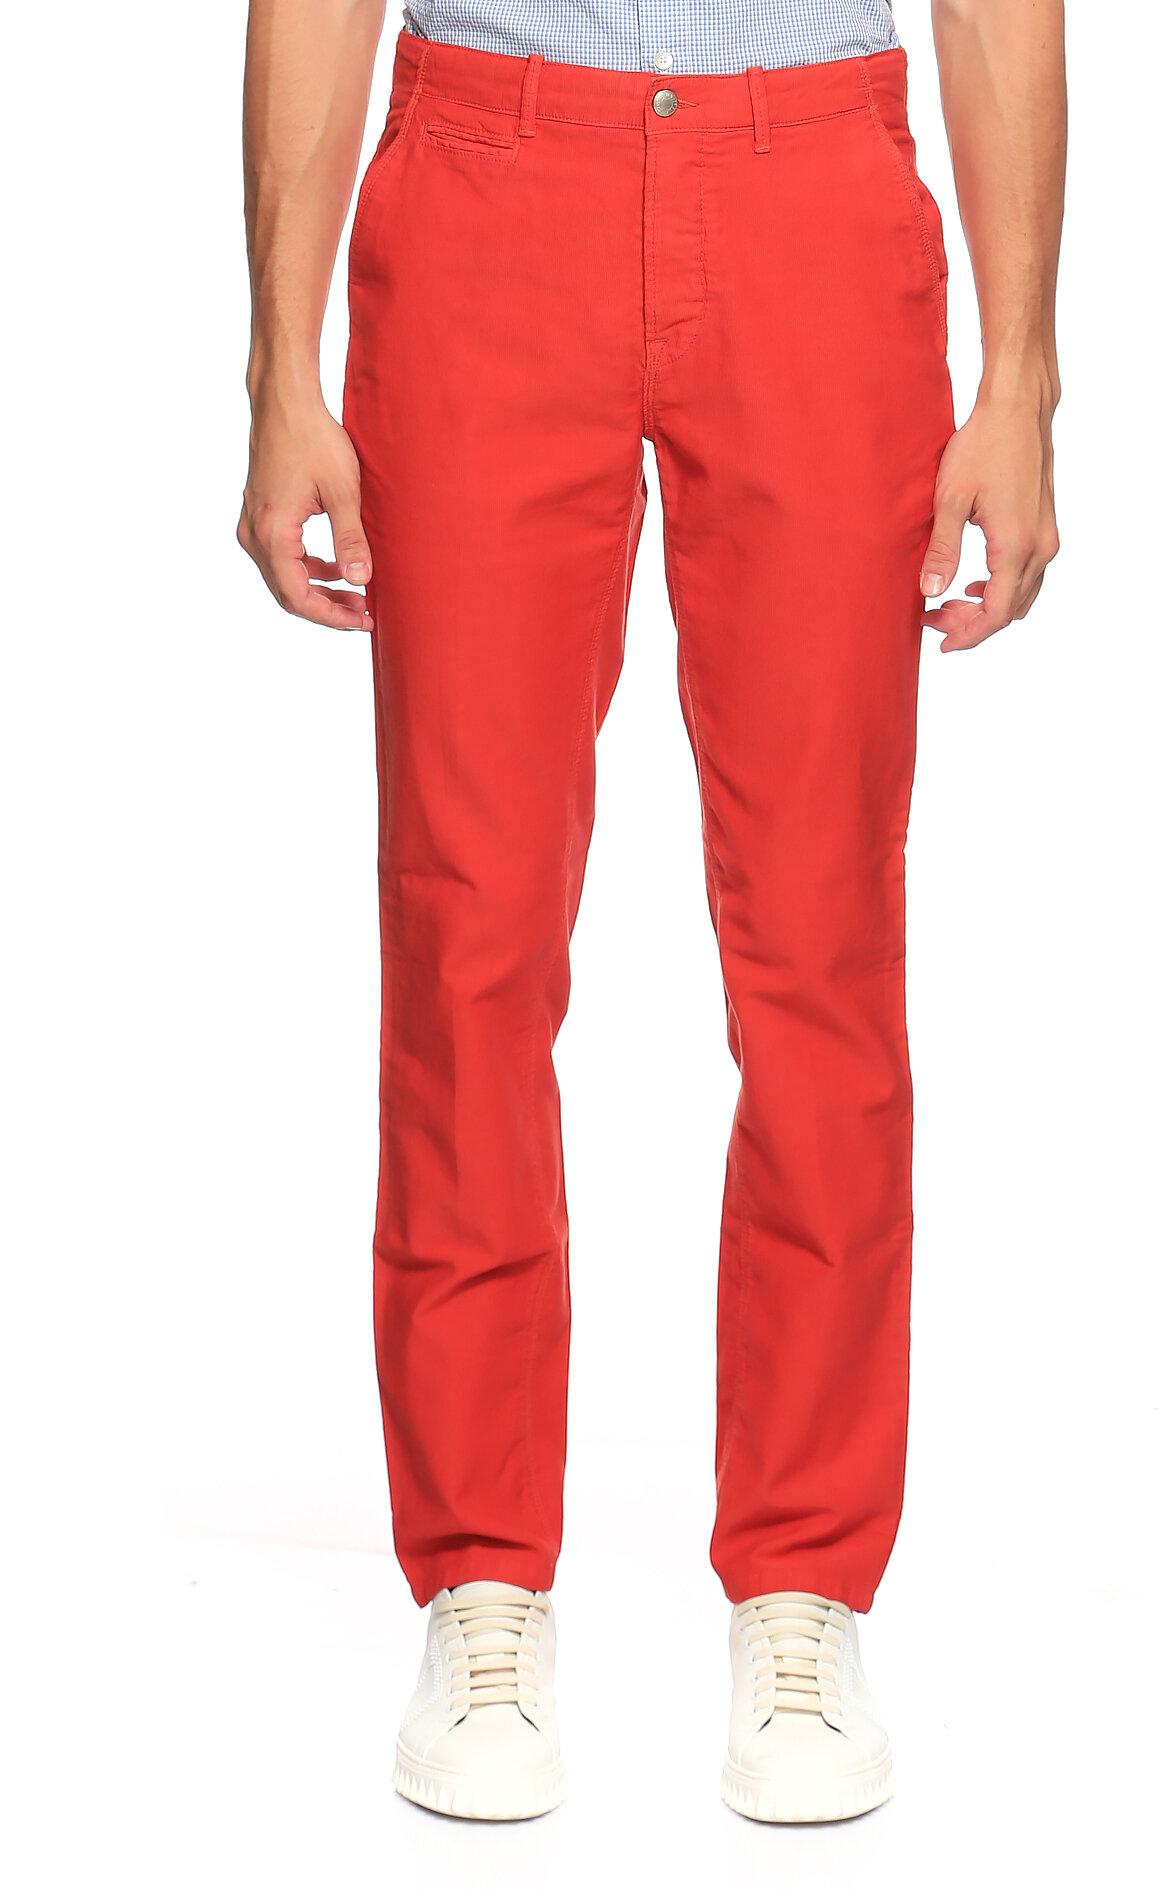 7 For All Mankind-7 For All Mankind Kırmızı Pantolon